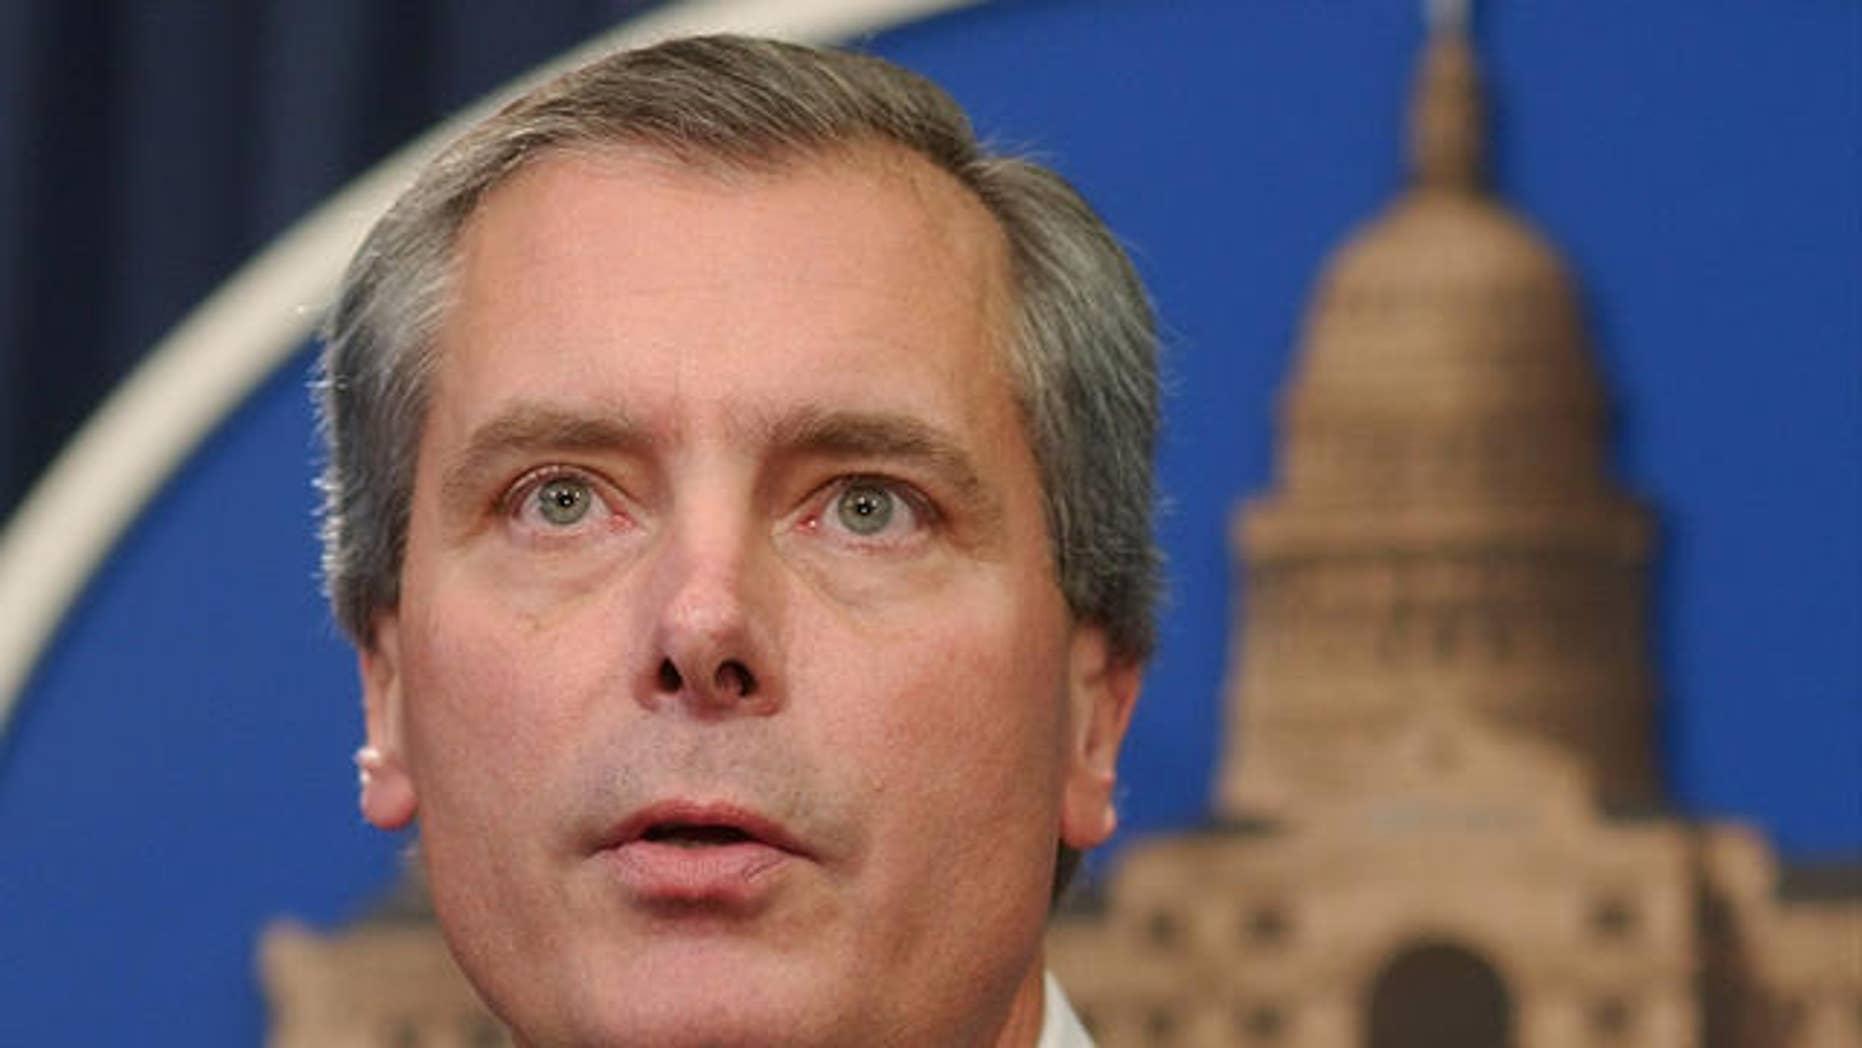 Texas Lt. Governor David Dewhurst